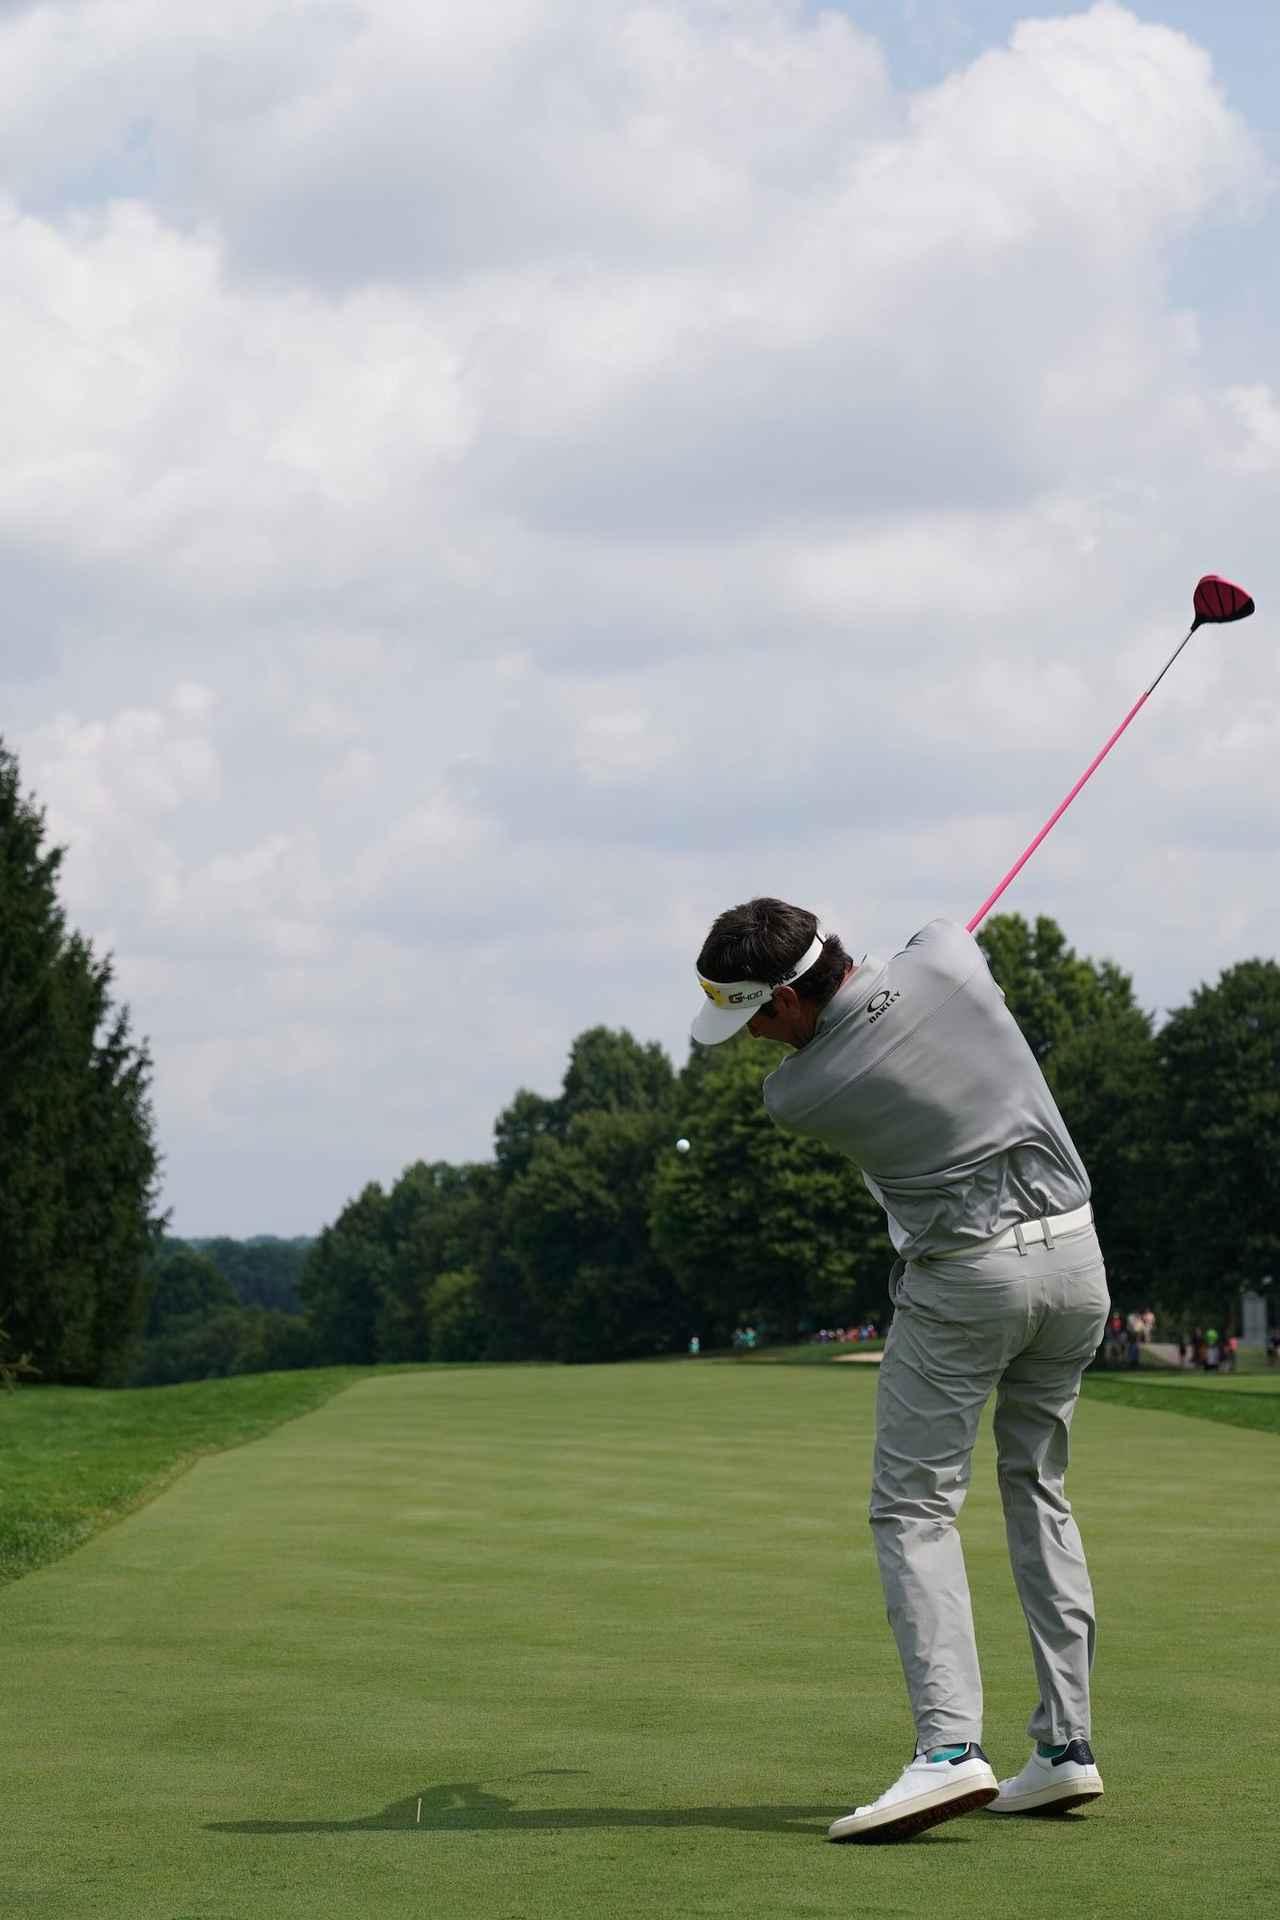 Images : 18番目の画像 - 強烈! バッバ・ワトソンのドライバーショット - みんなのゴルフダイジェスト